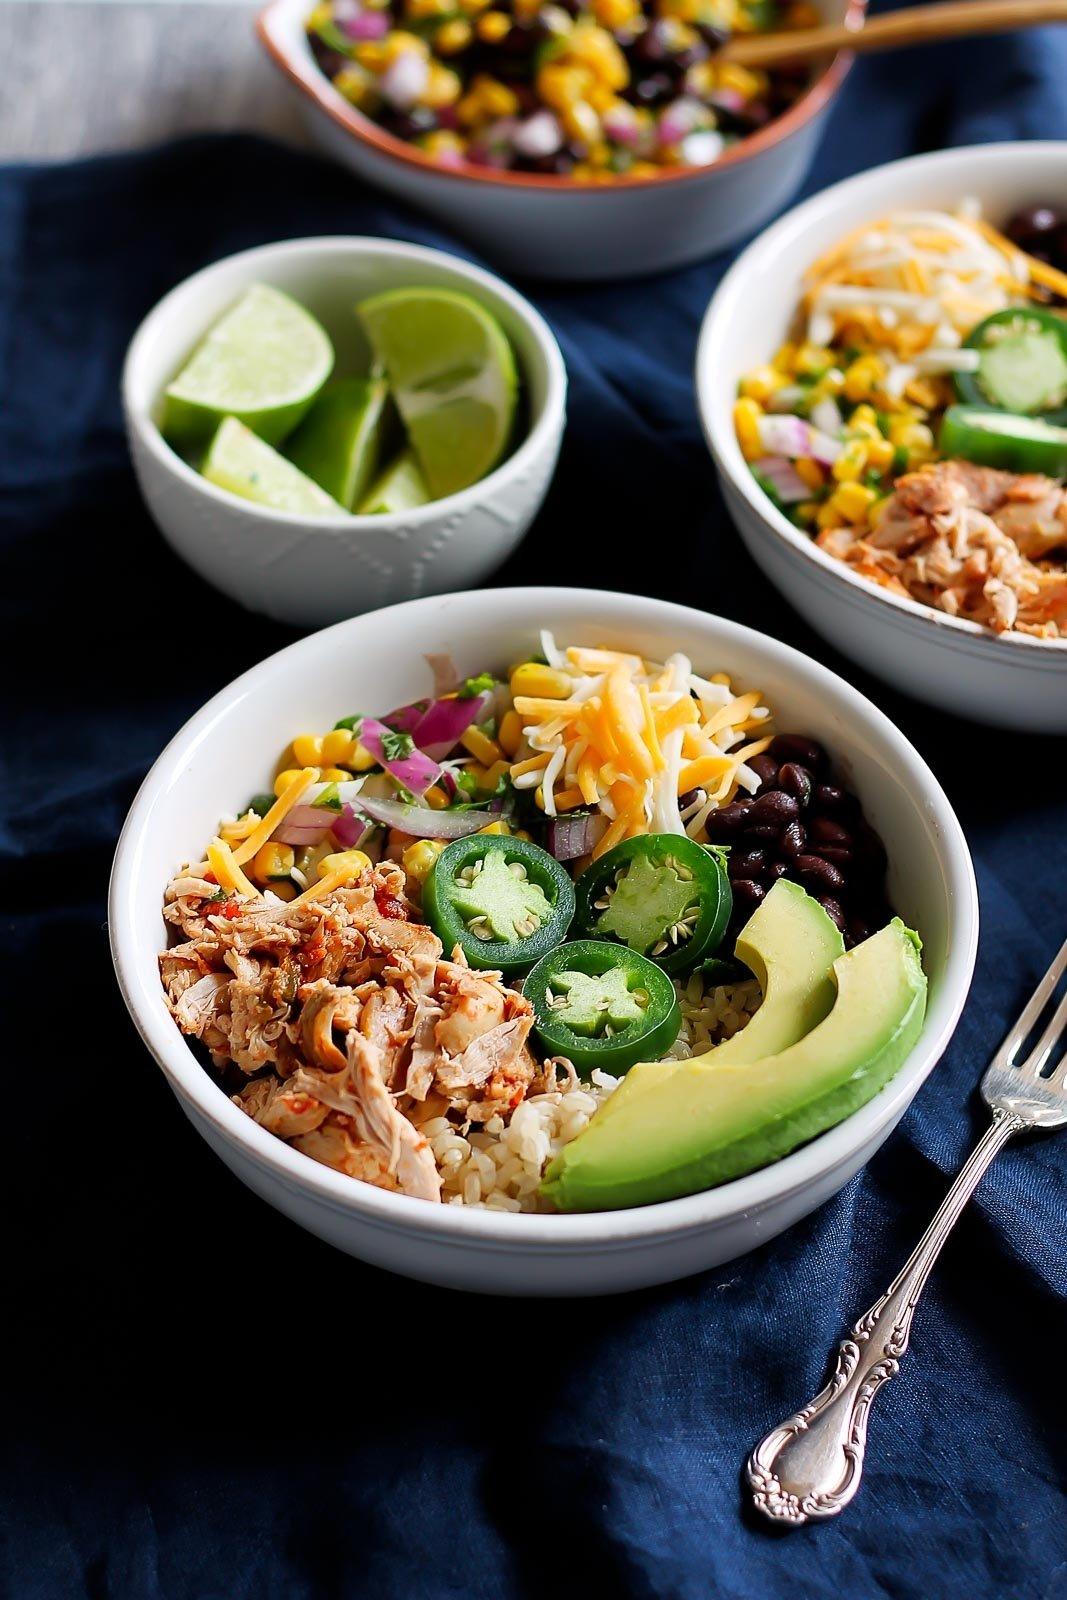 10 Pretty Clean Eating Meal Prep Ideas cheap healthy meal prep idea better than chipotle diy chicken 2020